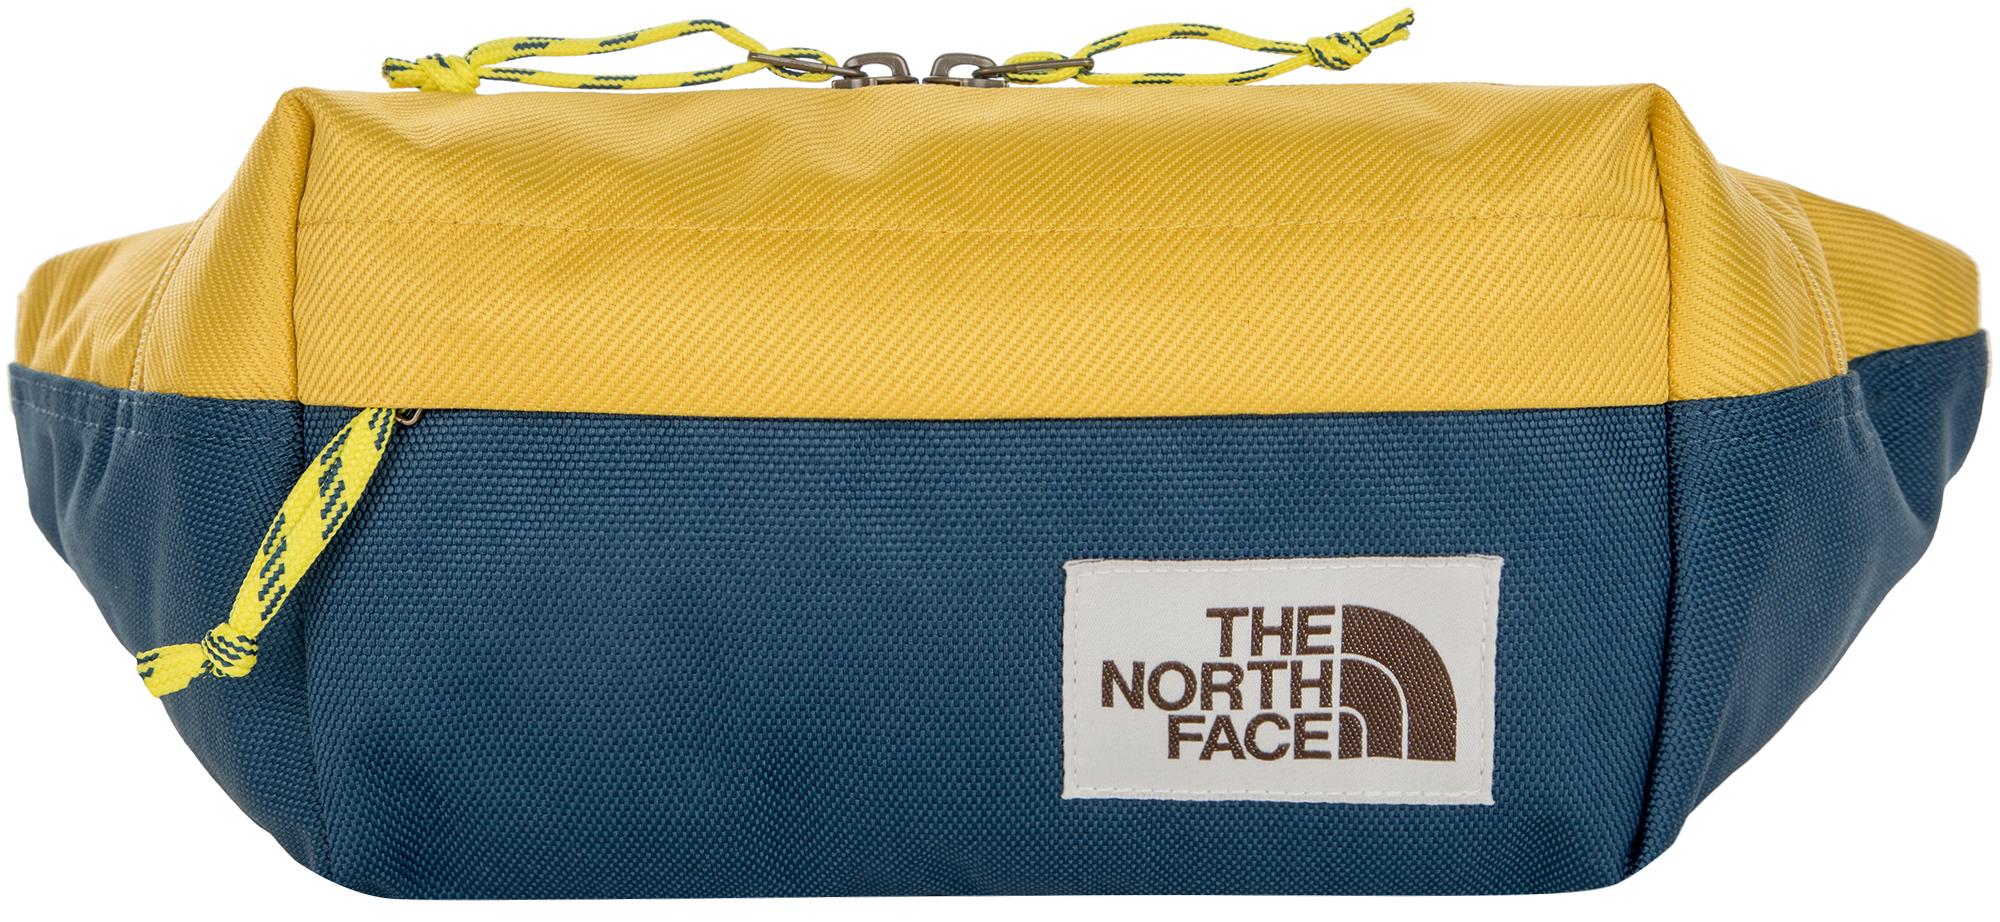 The North Face Сумка на пояс The North Face Lumbar